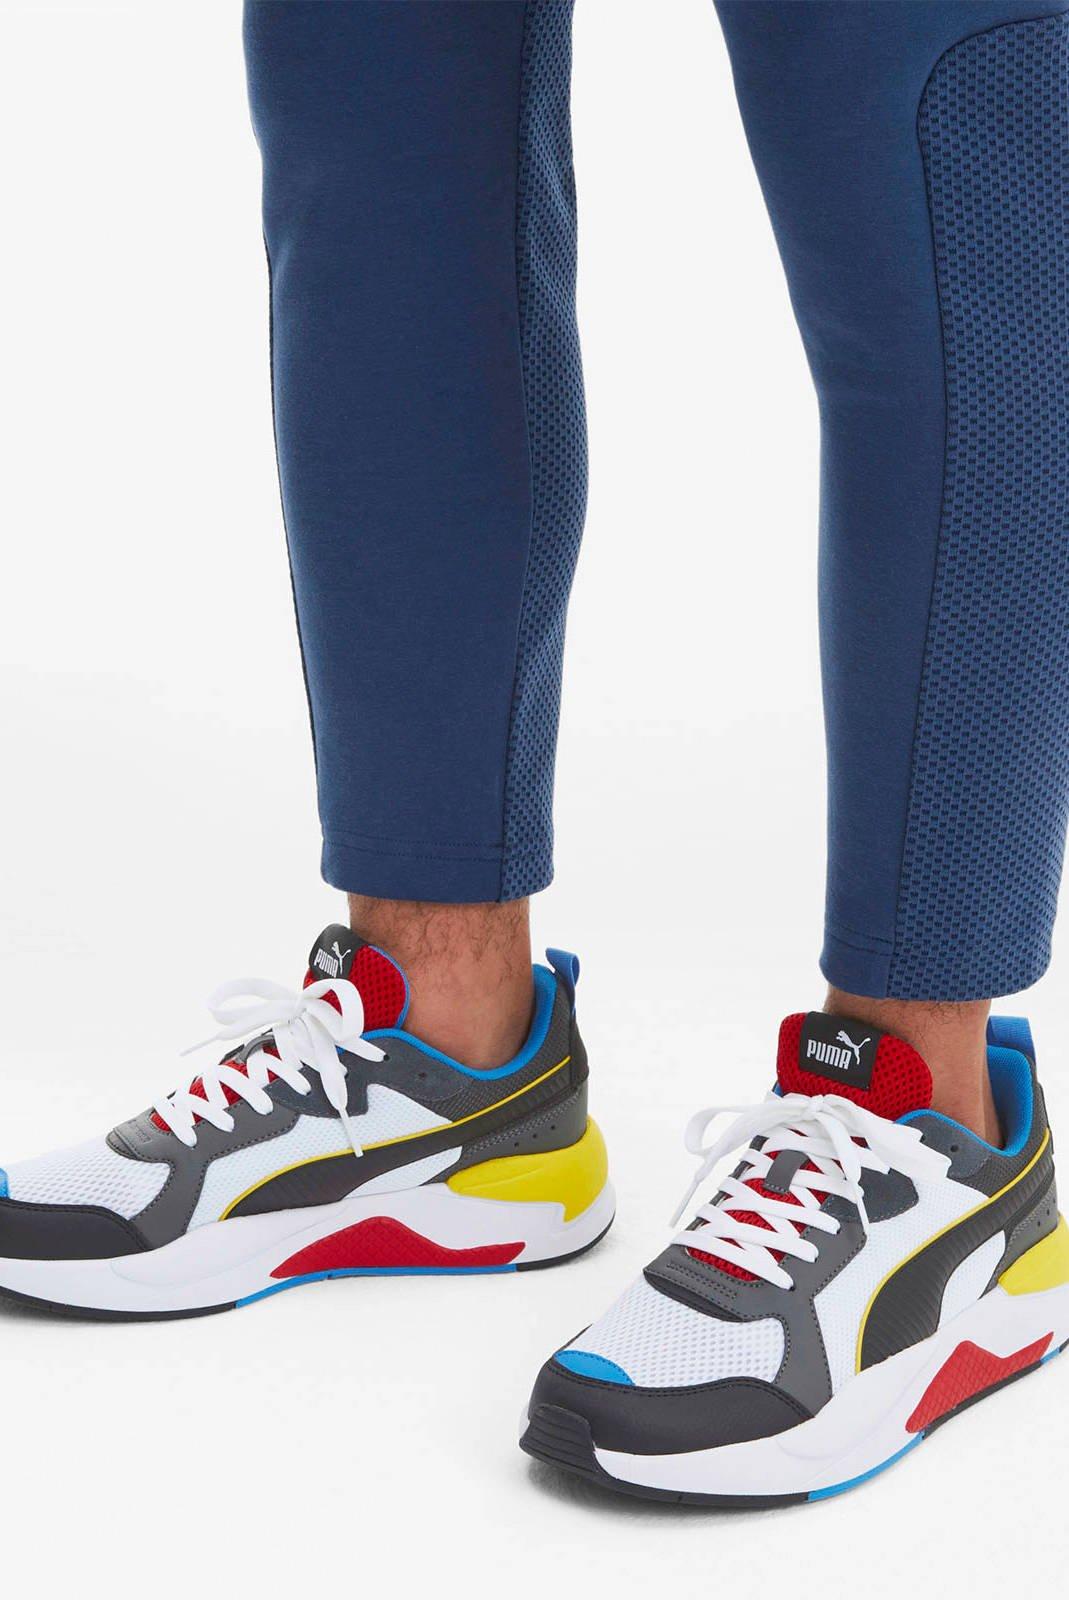 Puma X-Ray sneakers wit/zwart/rood/geel   wehkamp